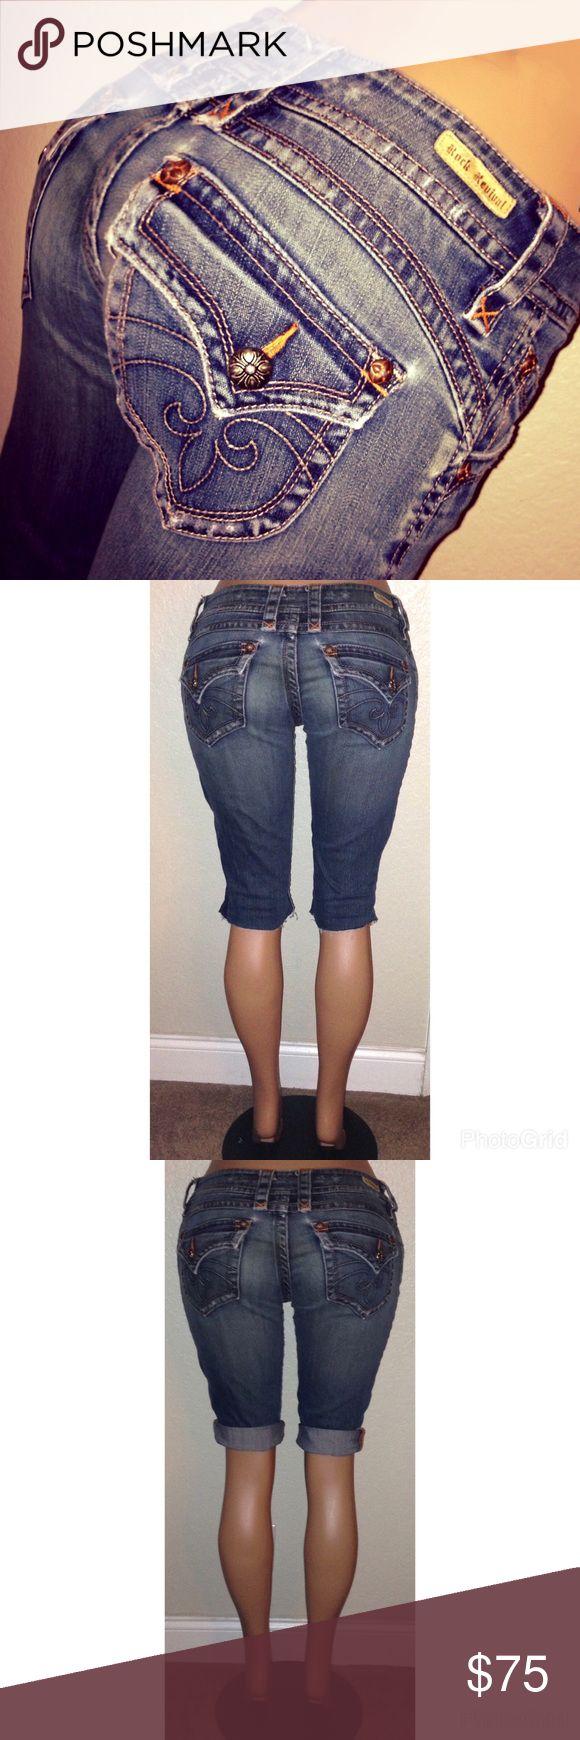 Spotted while shopping on Poshmark: Rock Revival Cut Off Capris Pedal Pushers Shorts! #poshmark #fashion #shopping #style #Rock Revival #Pants